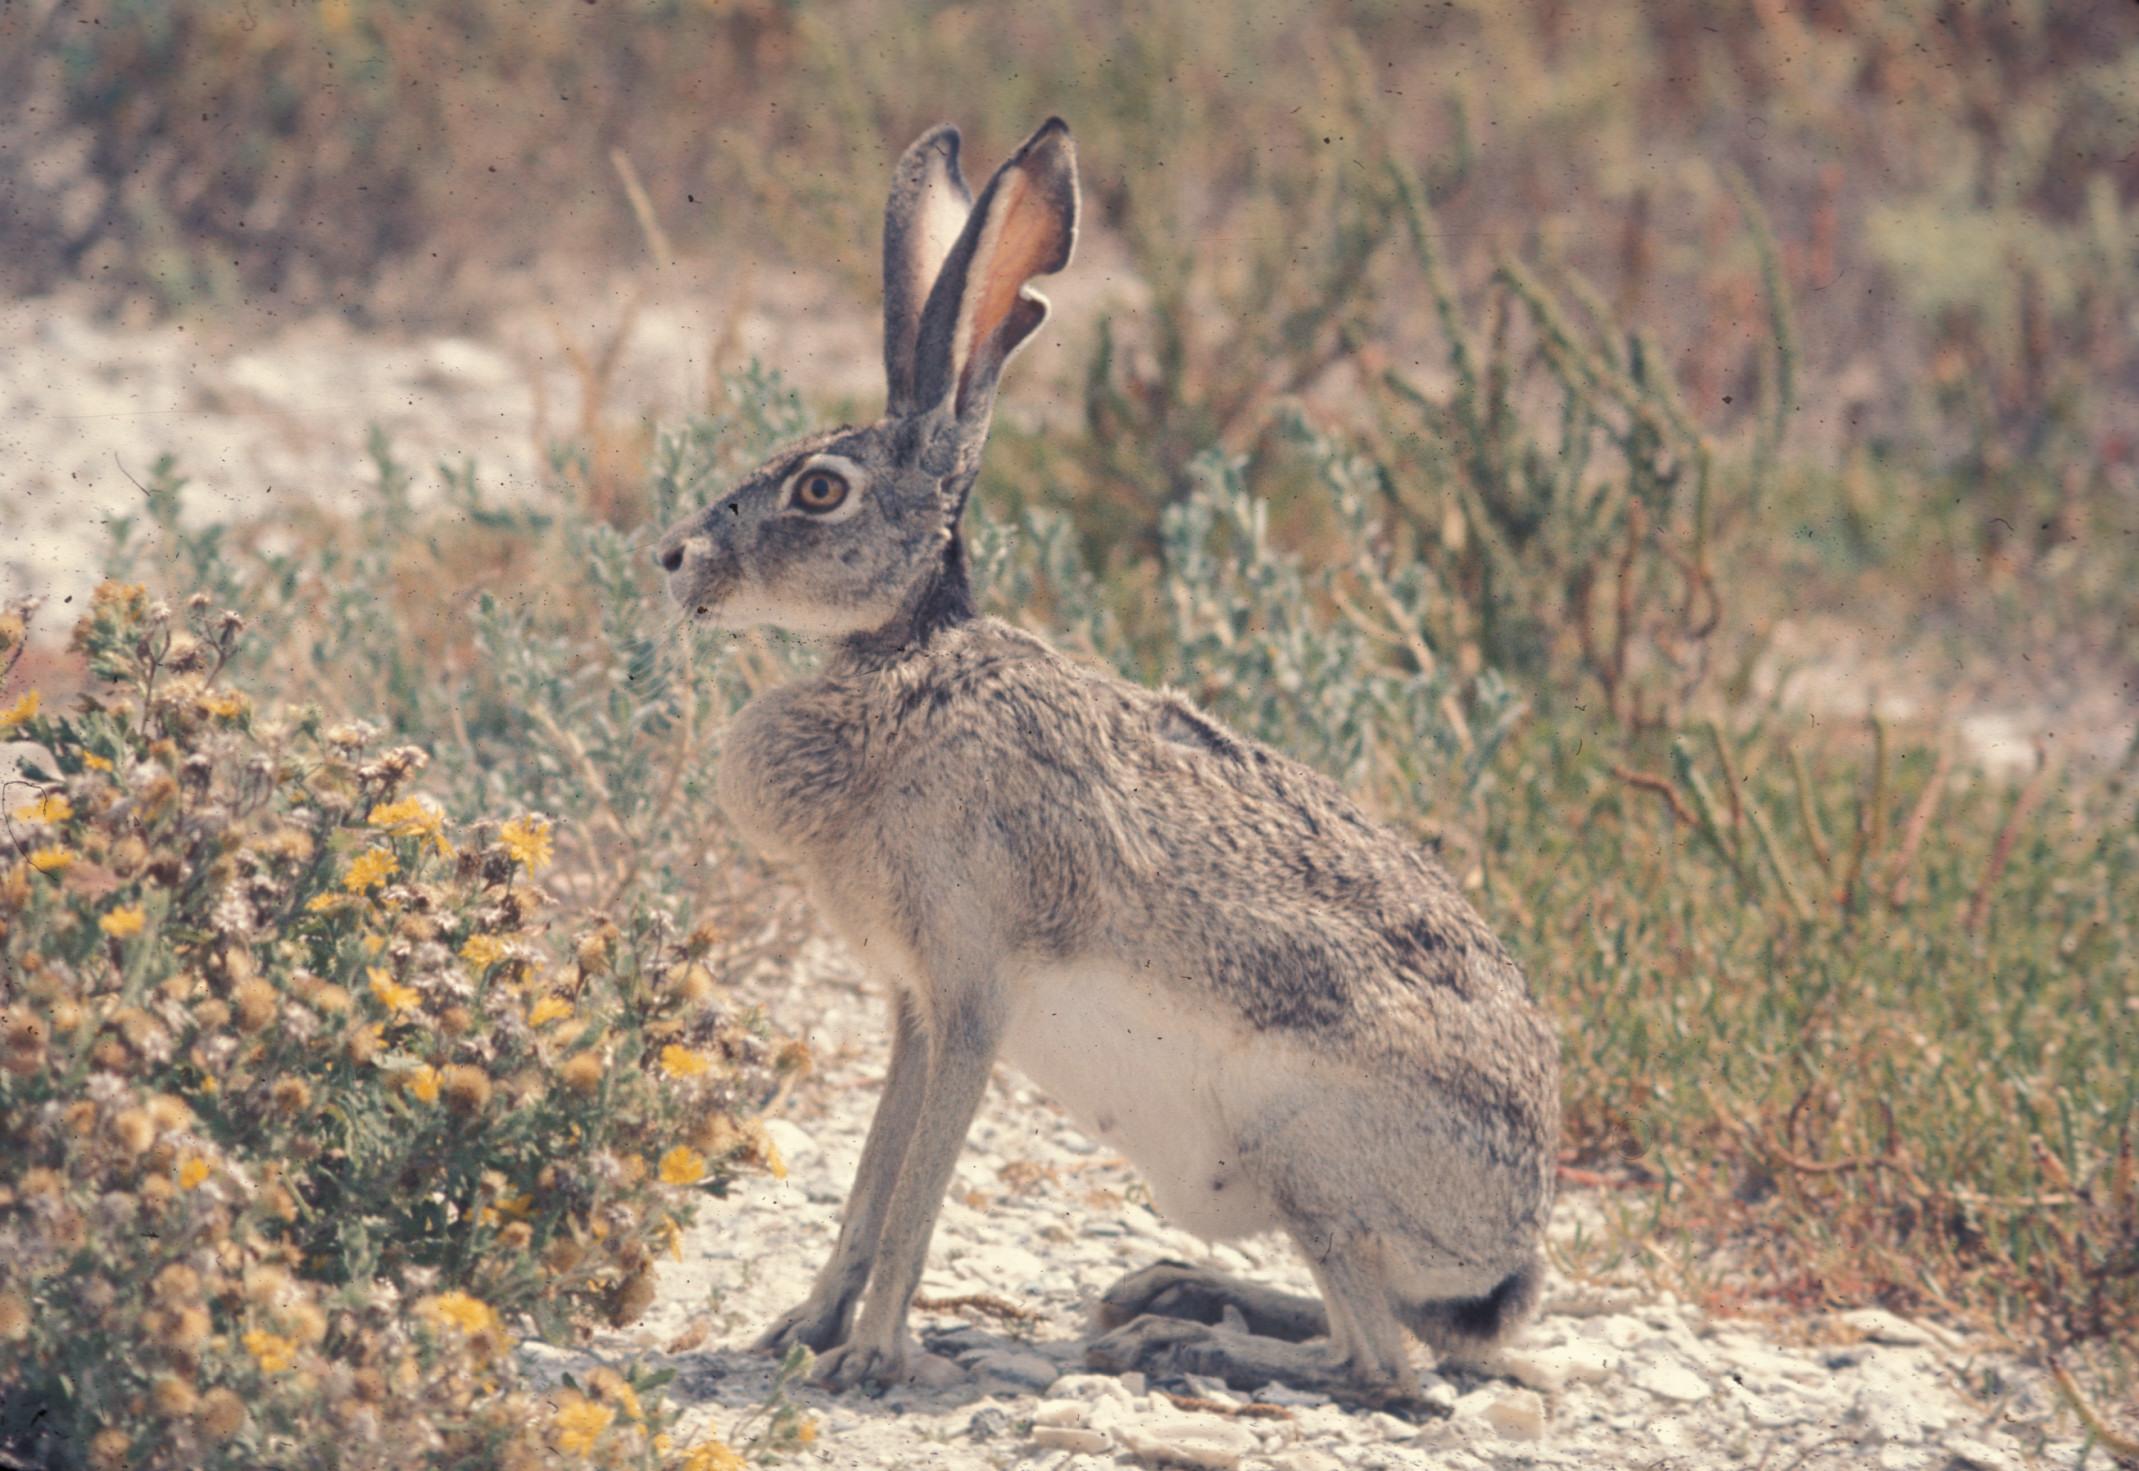 Drawn rabbit grassland animal Transitional Fossil: 2009 A Notes